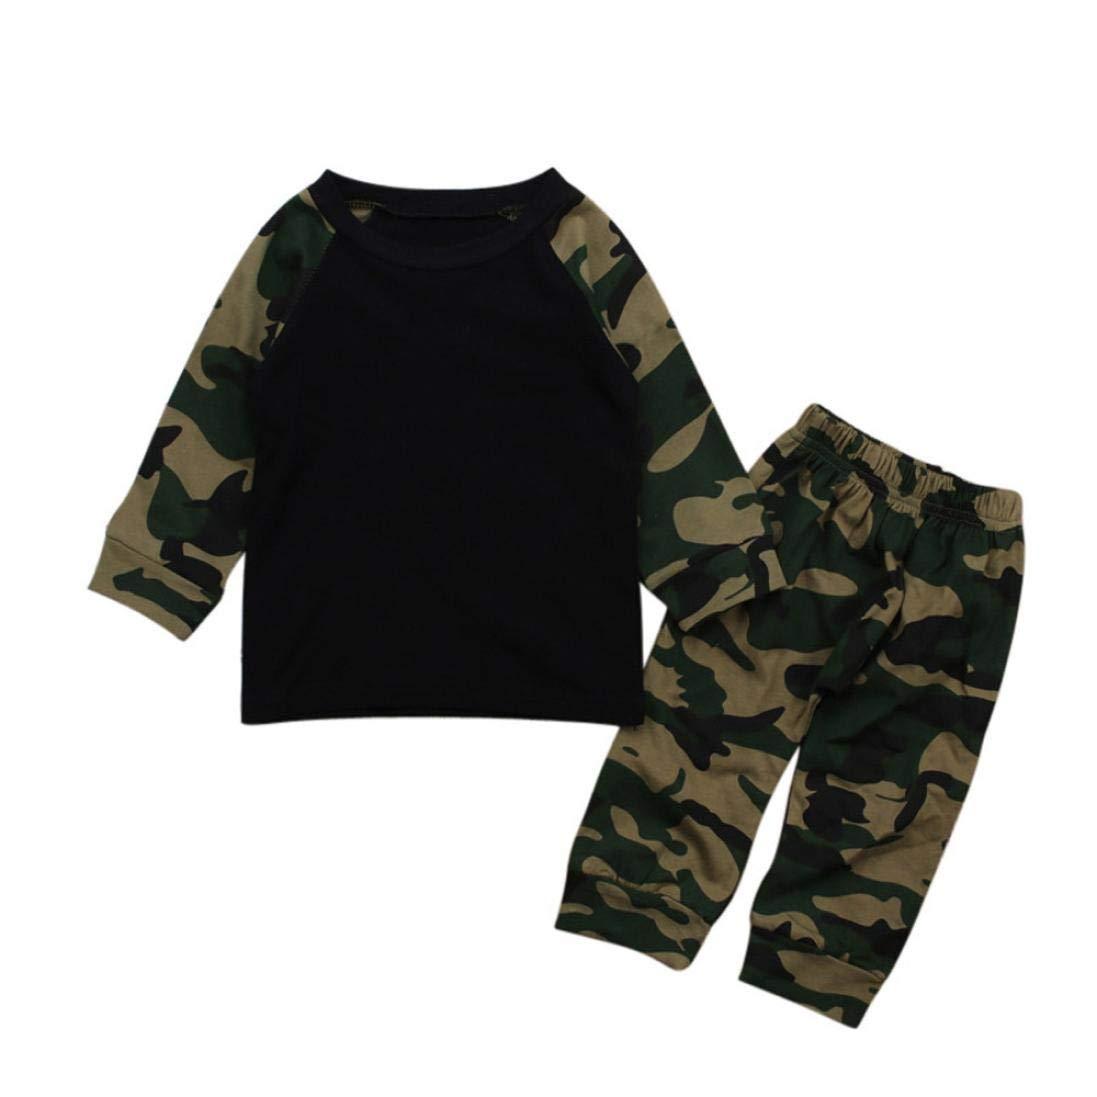 Matoen Newborn Infant Baby Boy Camouflage Long Sleeve Tops Pants Outfits 2pcs